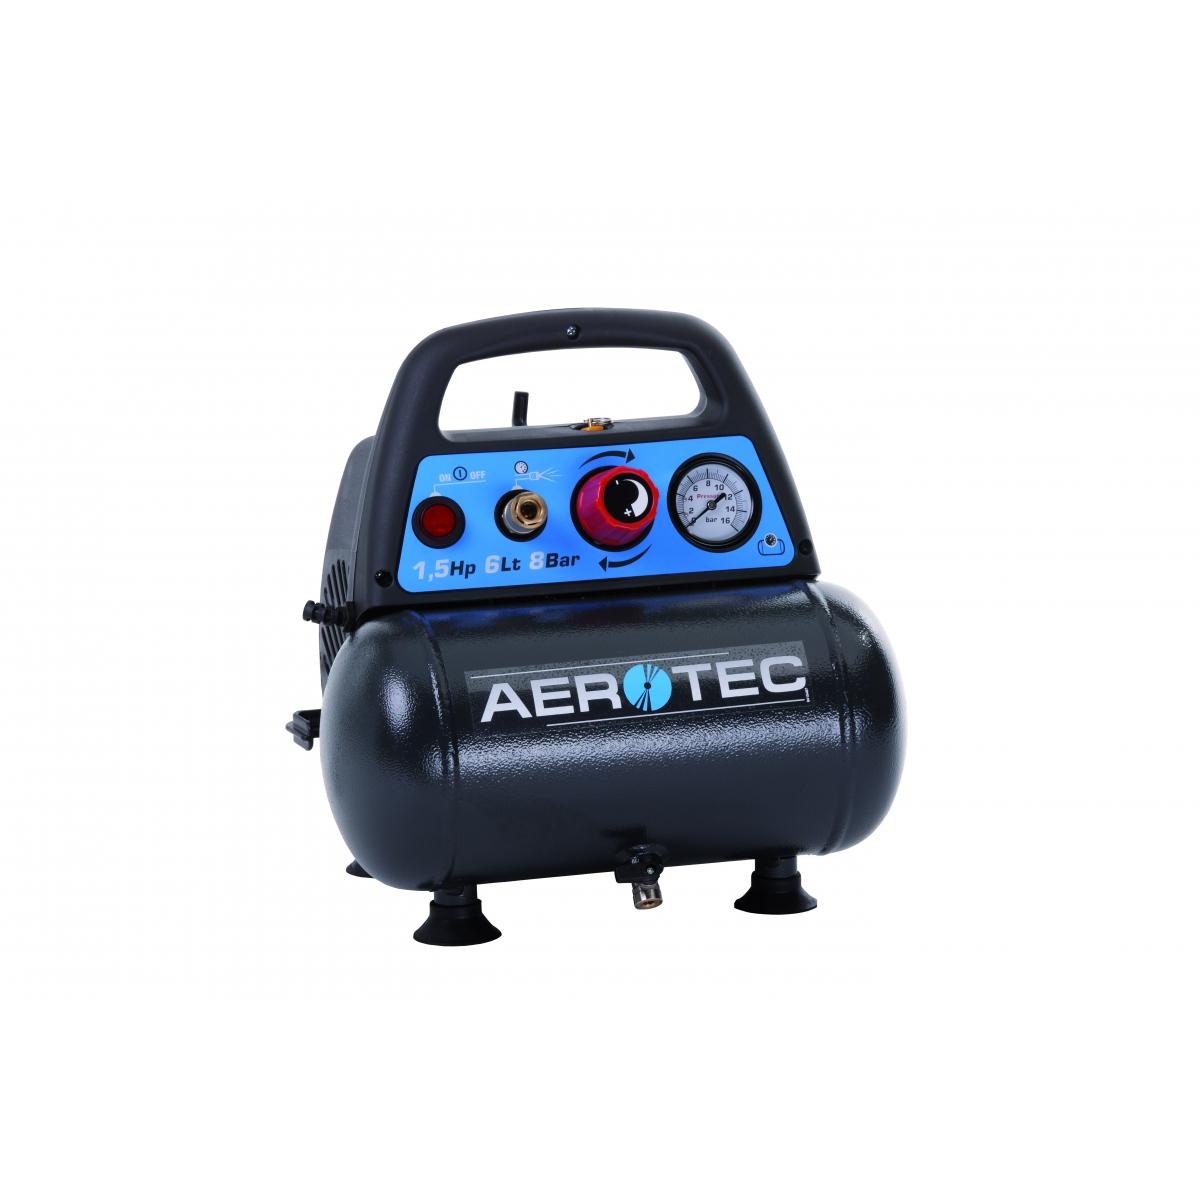 aerotec druckluft kolbenkompressor kompressor tragbar lfrei. Black Bedroom Furniture Sets. Home Design Ideas